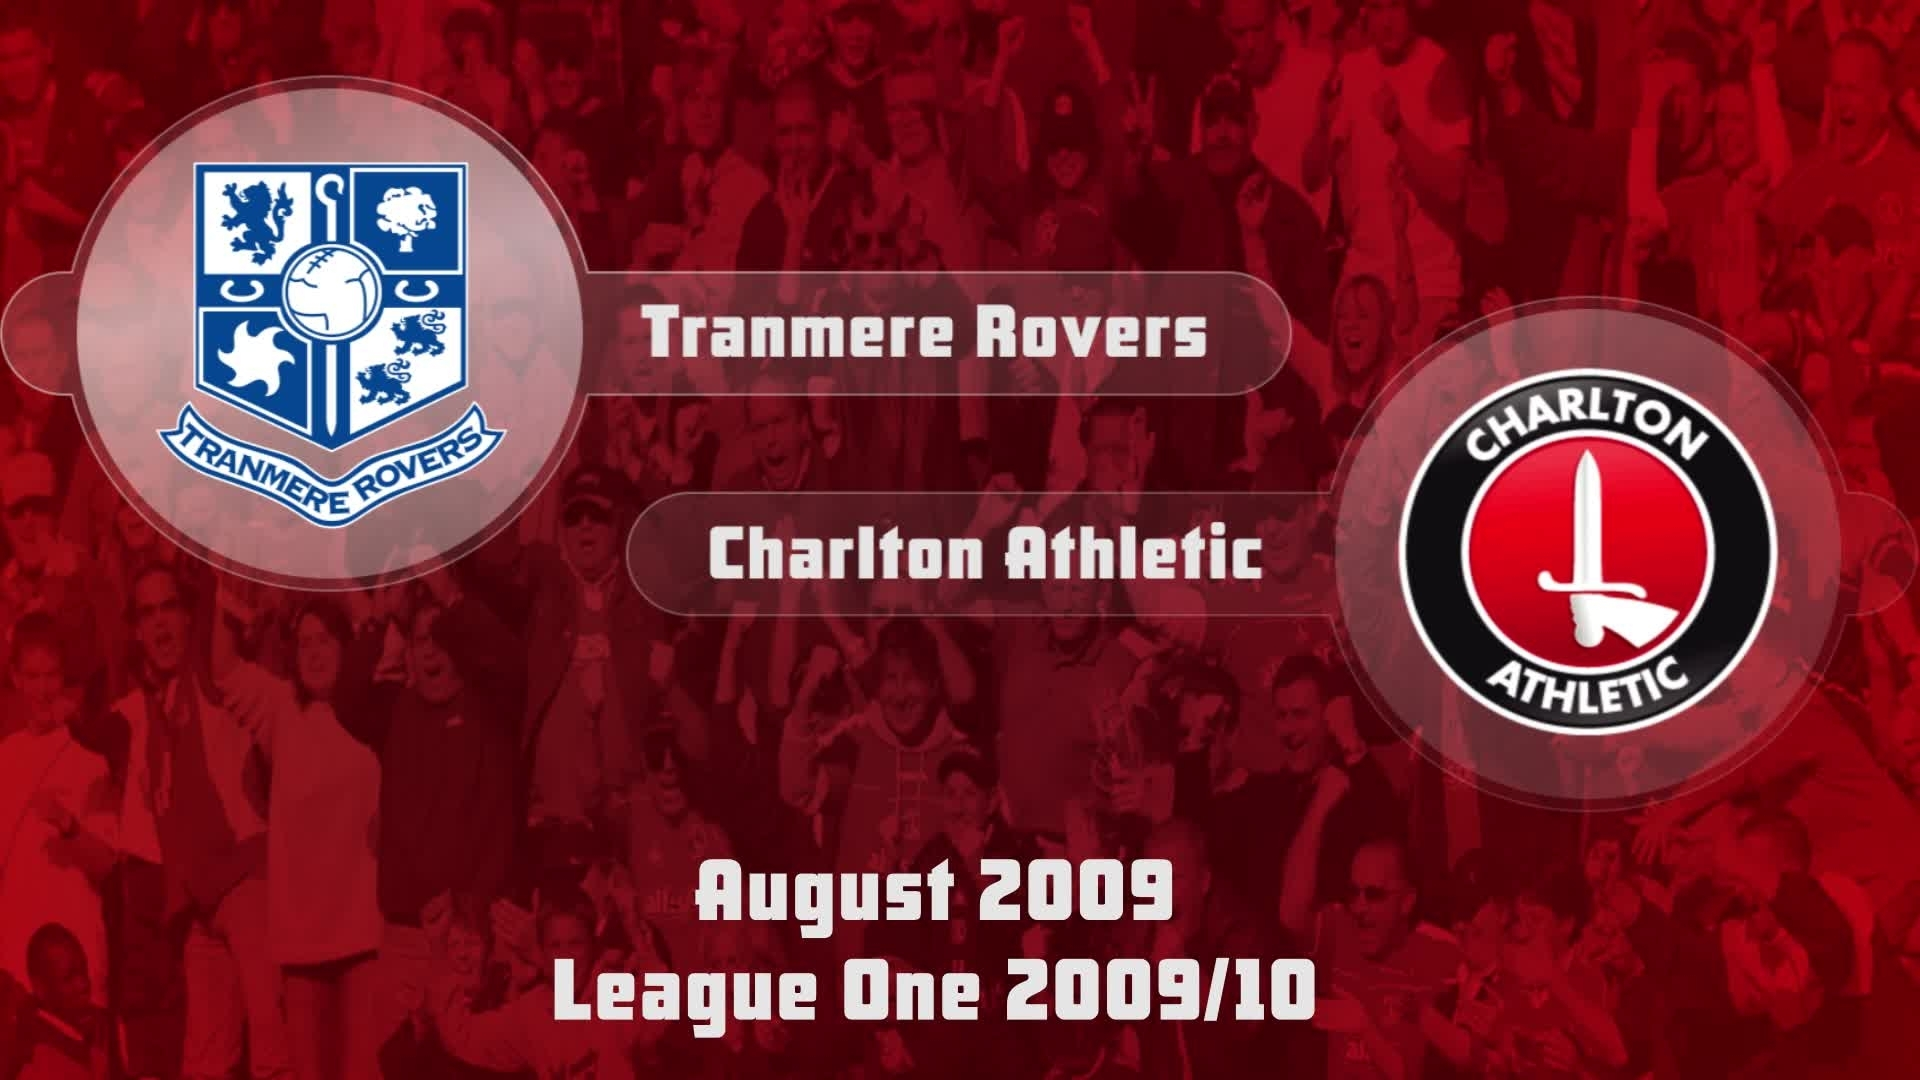 06 HIGHLIGHTS   Tranmere 0 Charlton 4 (Aug 2009)